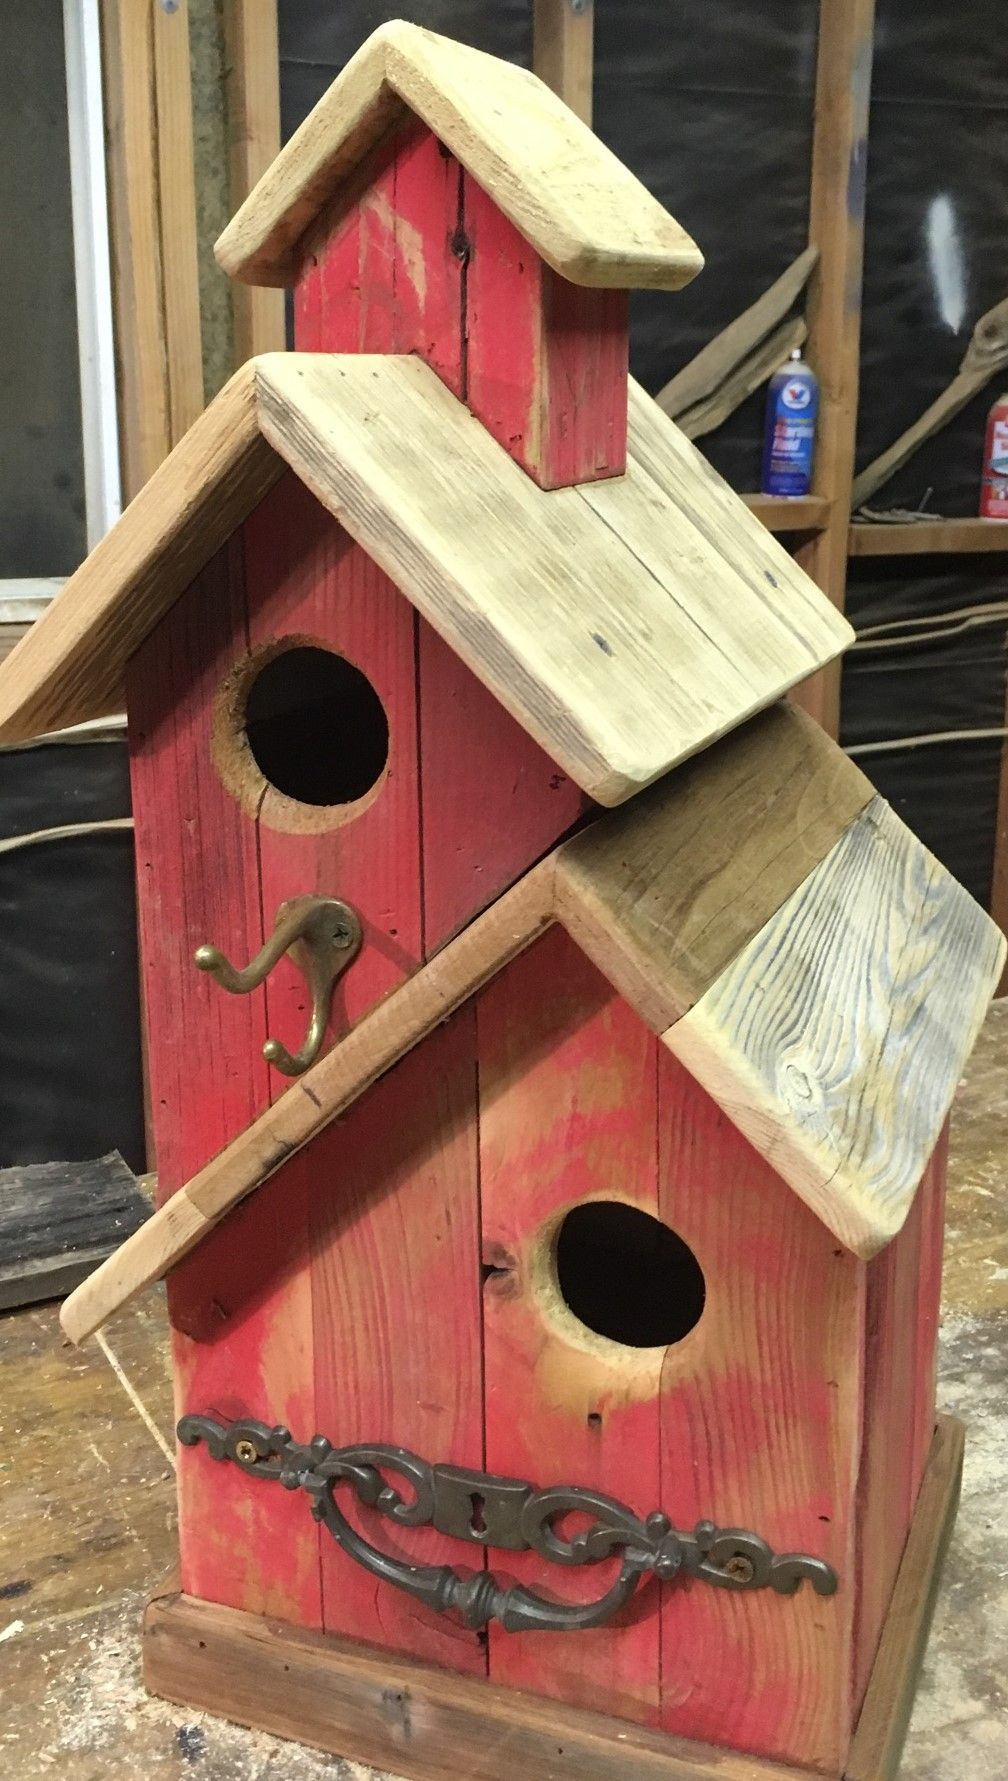 Threesistersharvest On Etsy Double Stacked With Vintage Decor Bird House Kits Decorative Bird Houses Bird House